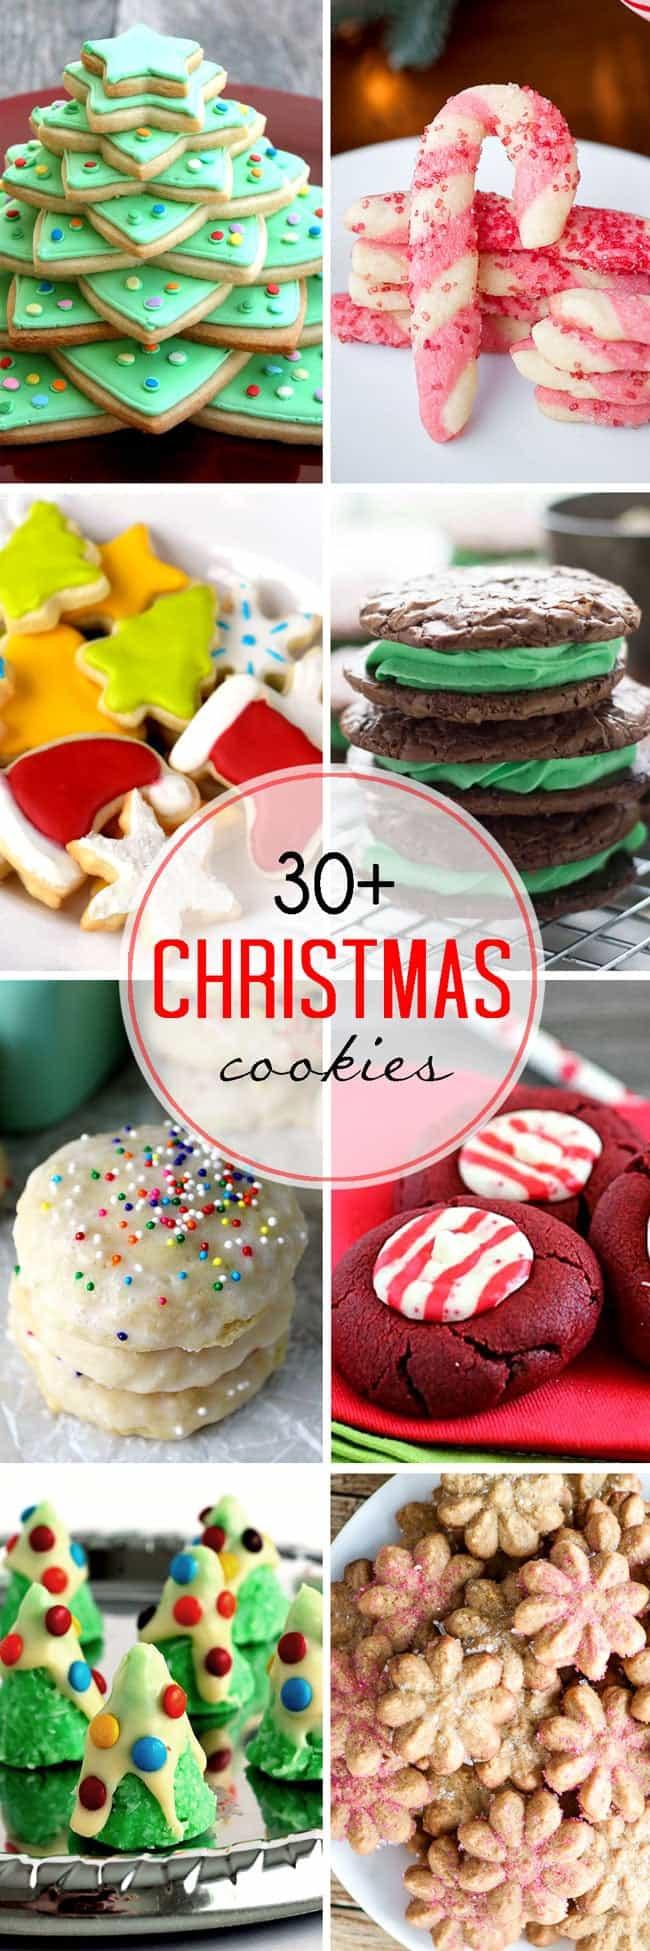 Baking Gifts For Christmas  30 Easy Christmas Cookies LemonsforLulu